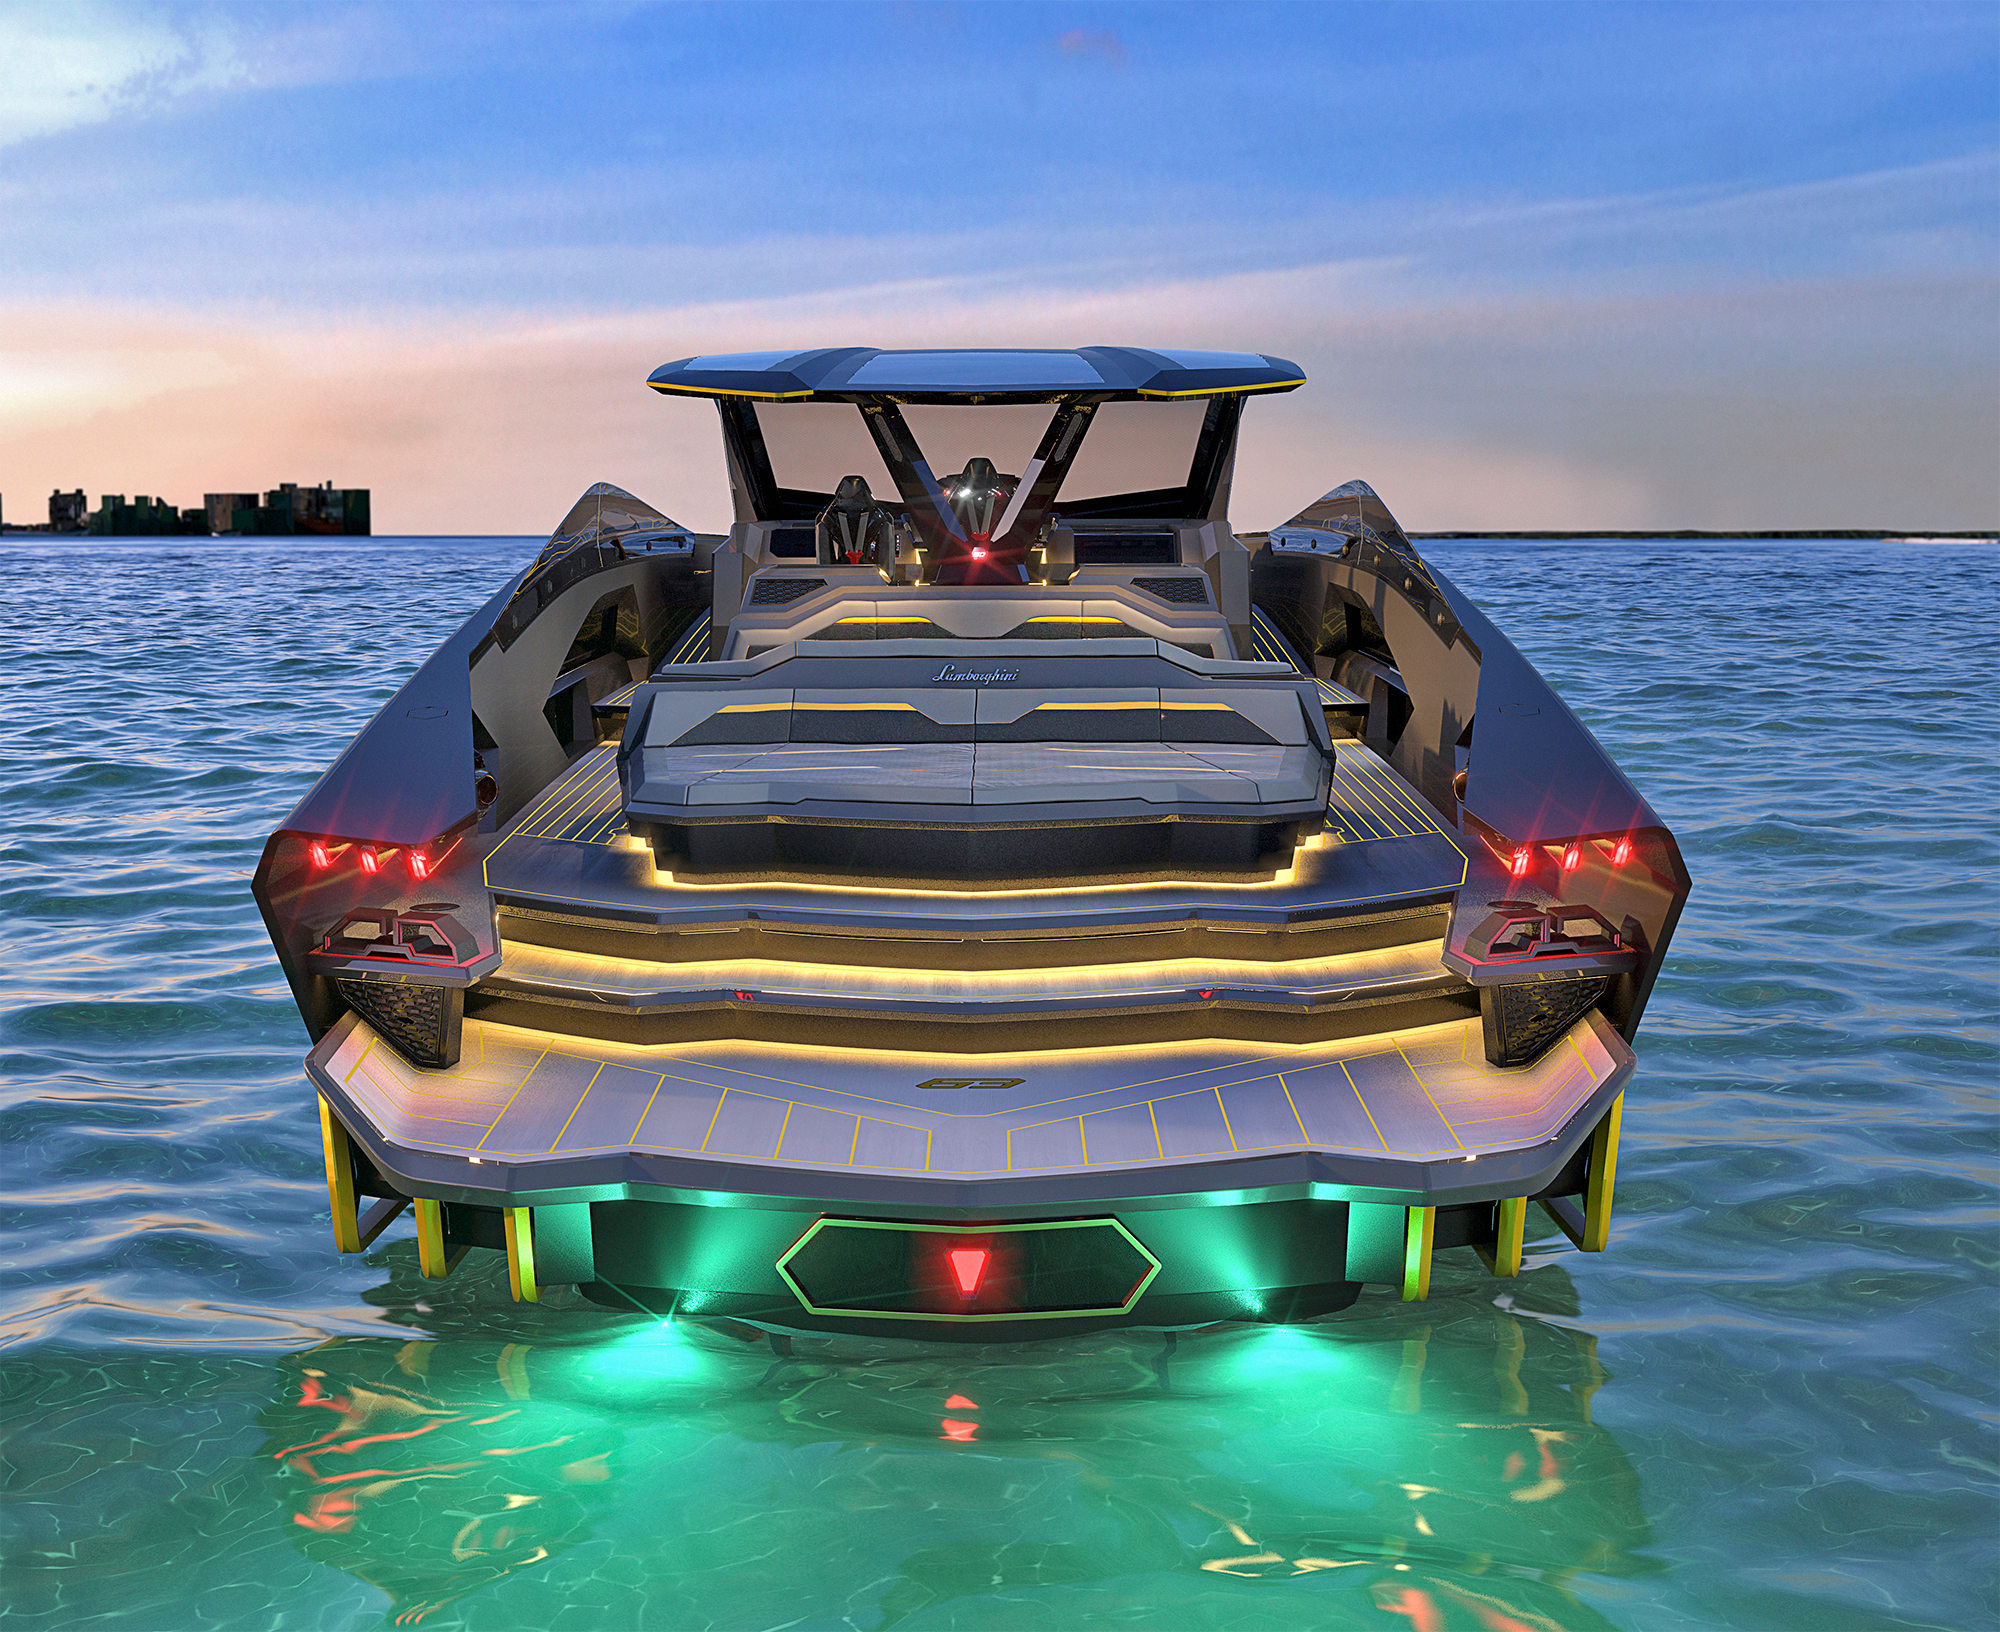 Aft Deck on a Tecnomar Lamborghini 63 Yacht